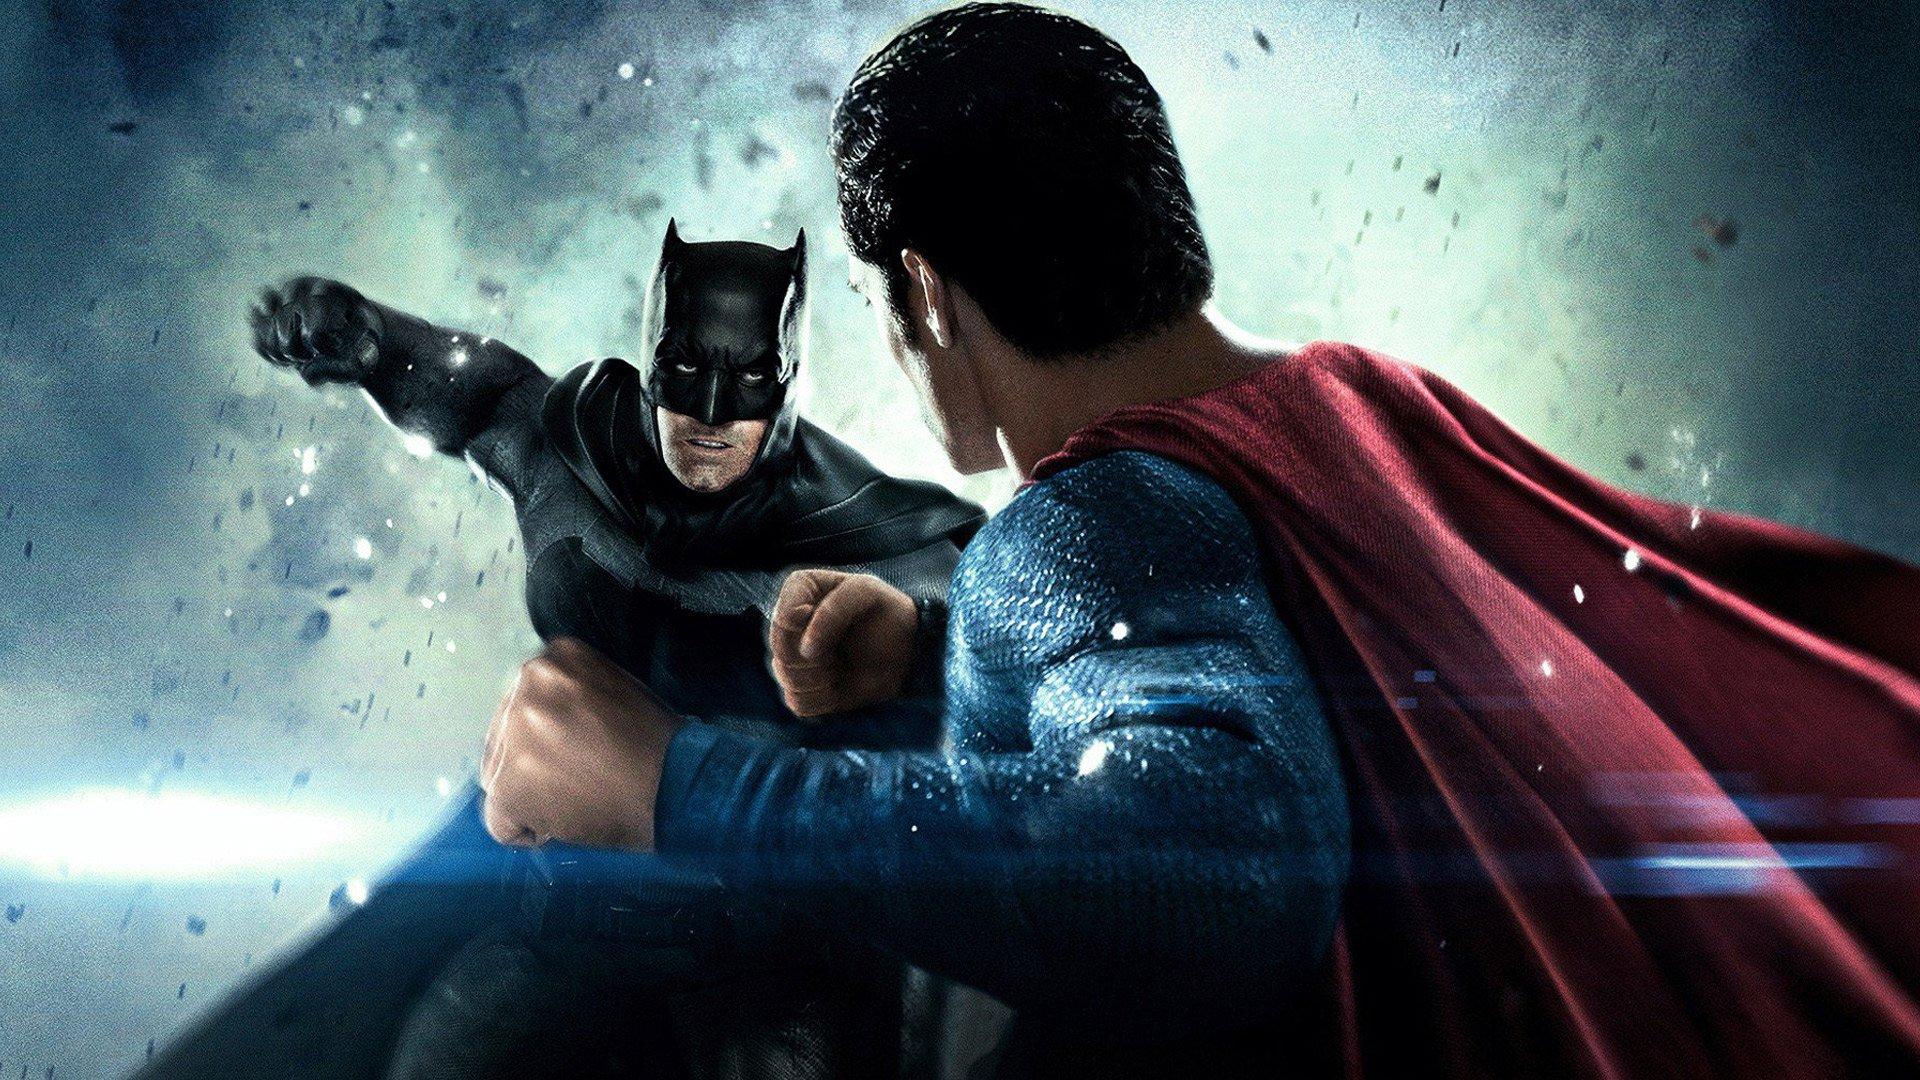 Why Batman v Superman: Dawn of Justice Is the Worst Modern DC Superhero Movie